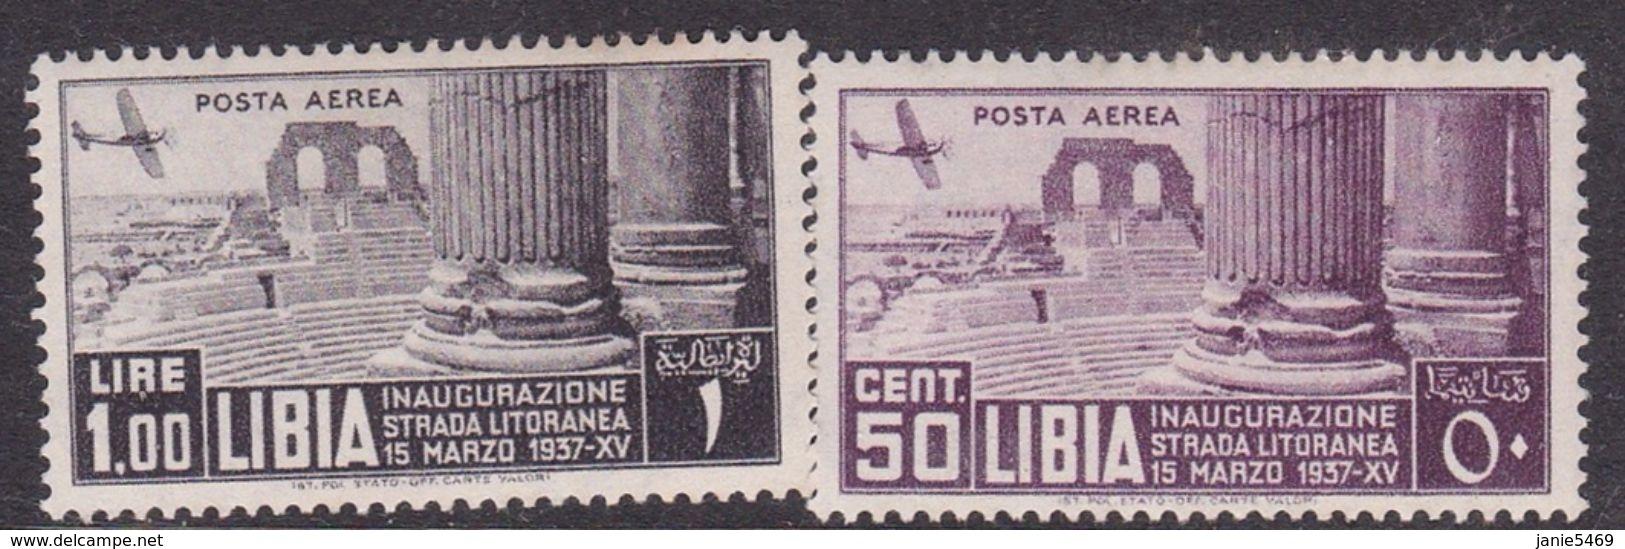 Italy-Colonies And Territories-Libya AP 32-33 1937 11th Tripoli Fair, Mint Hinged - Libya